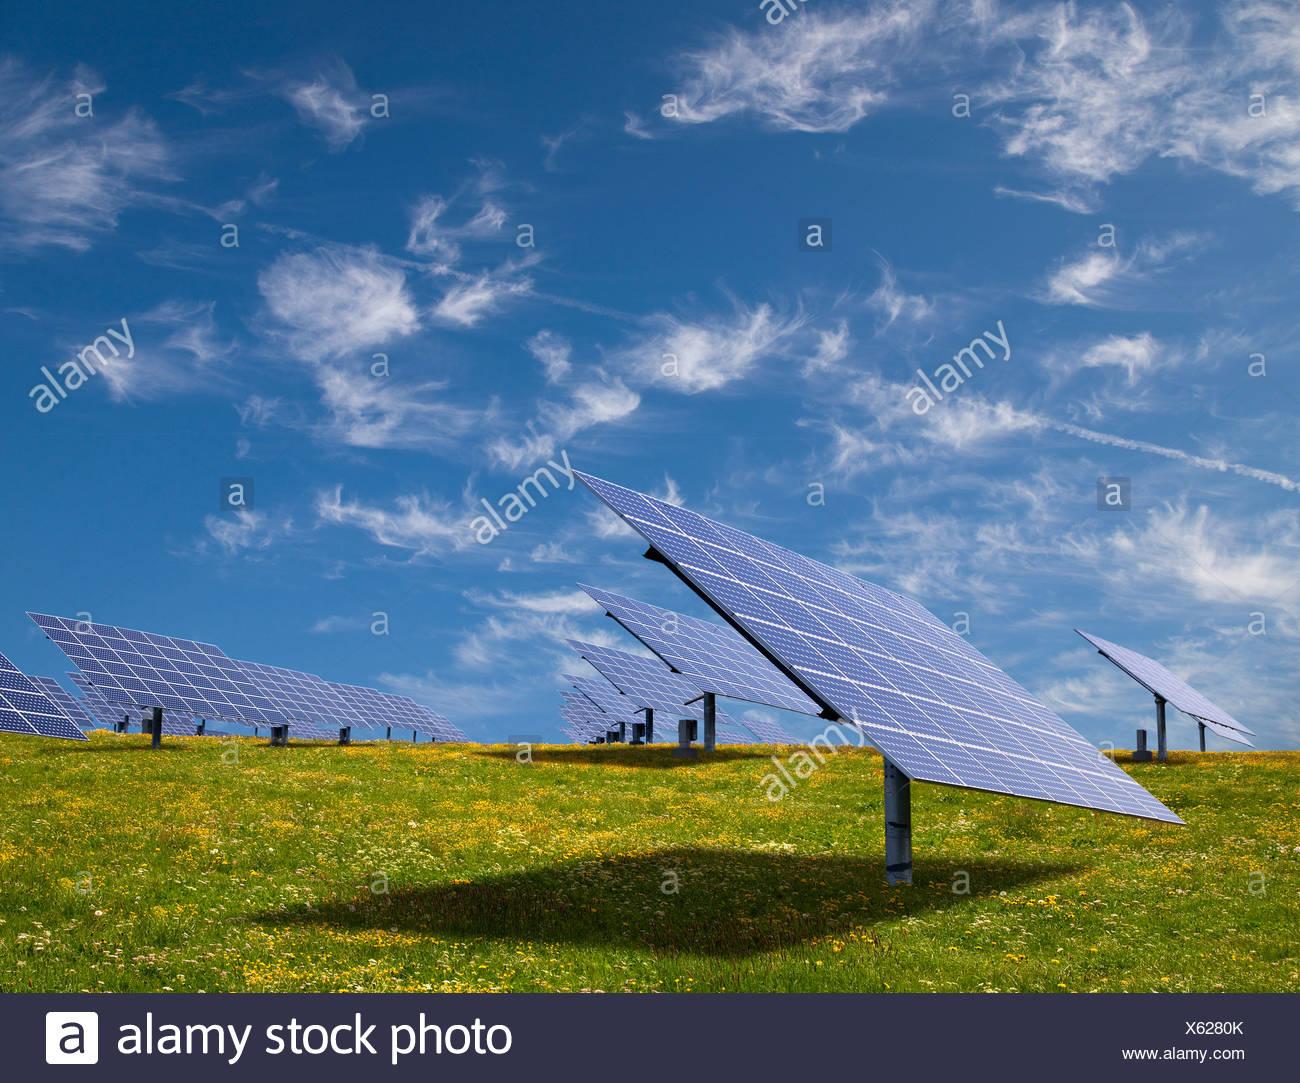 Solar panels in field - Stock Image